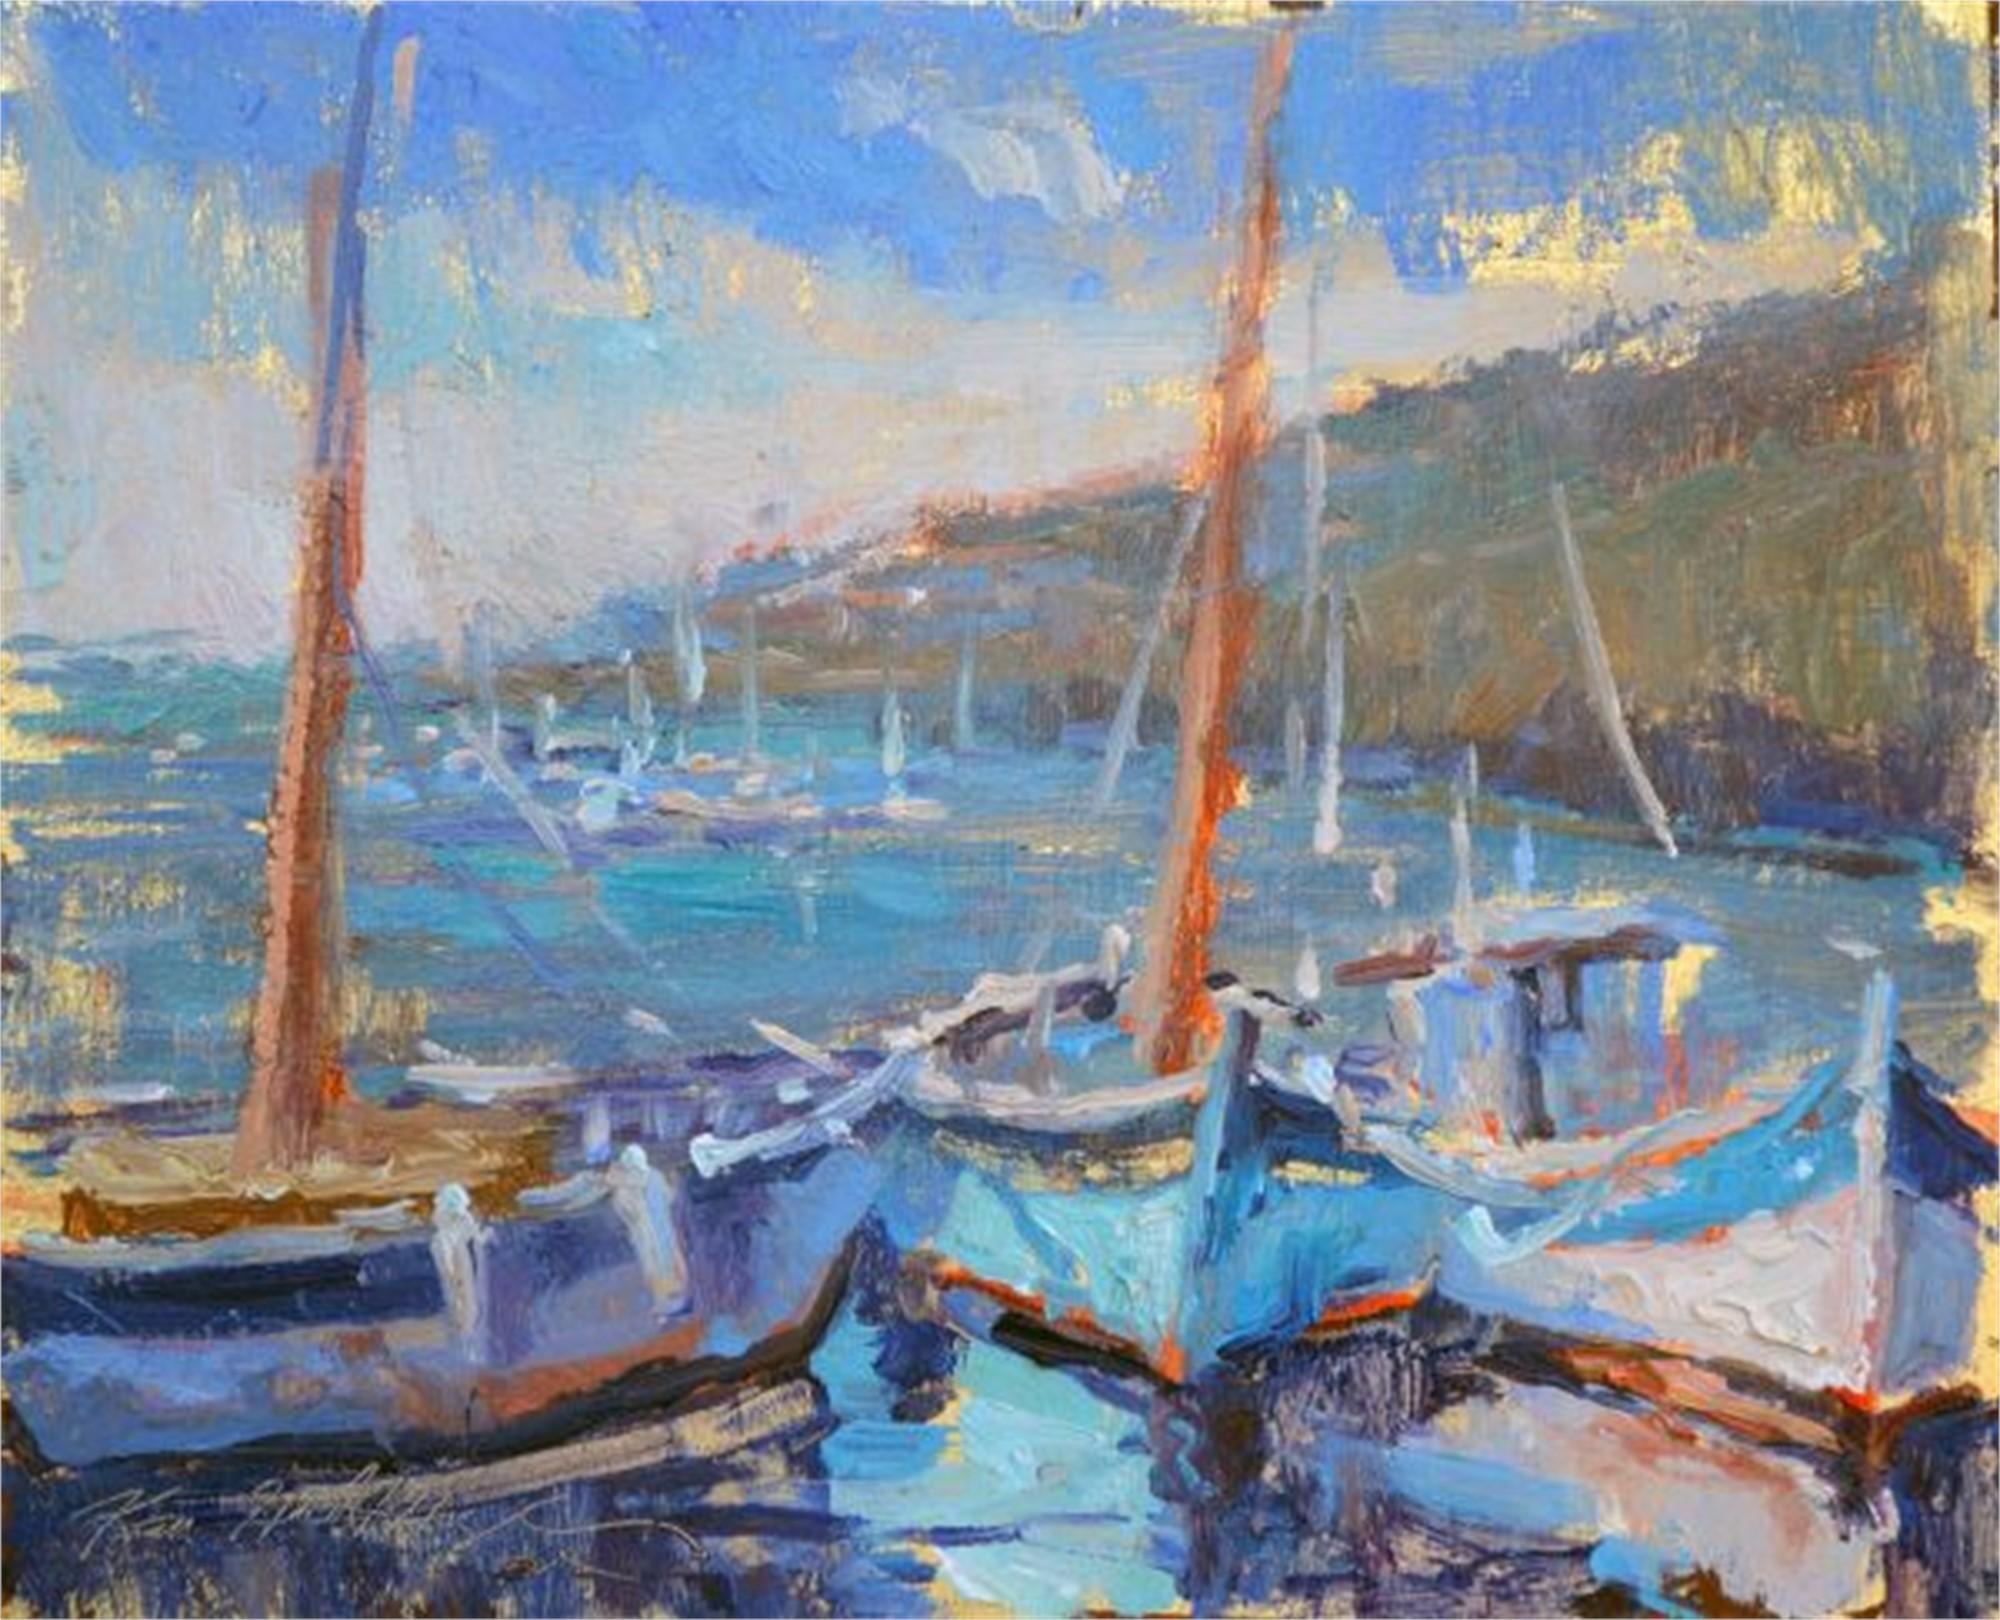 Fishing Boats South of France Coast by Karen Hewitt Hagan